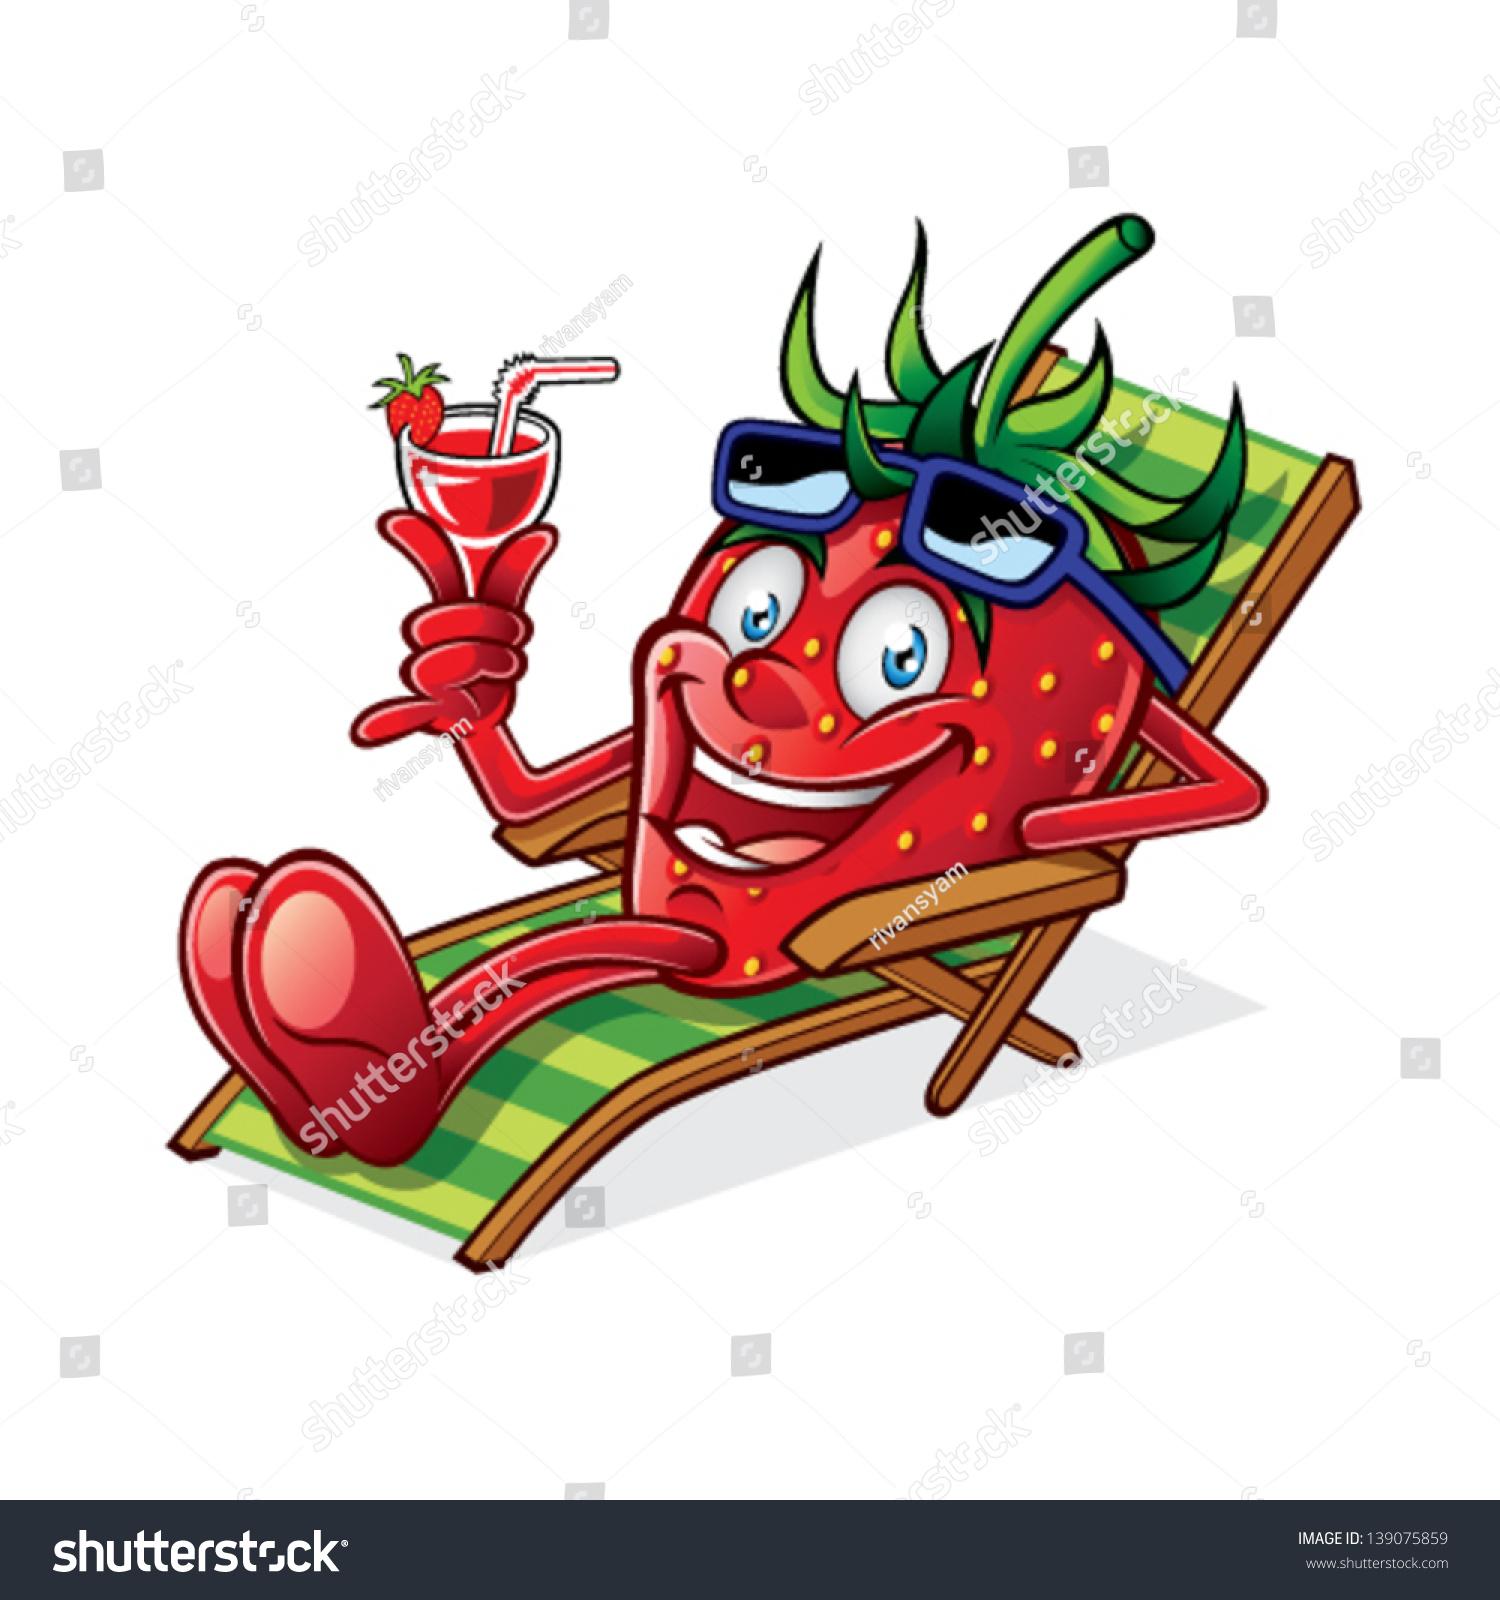 Cartoon Berry Relaxing On Beach Chair Stock Vector